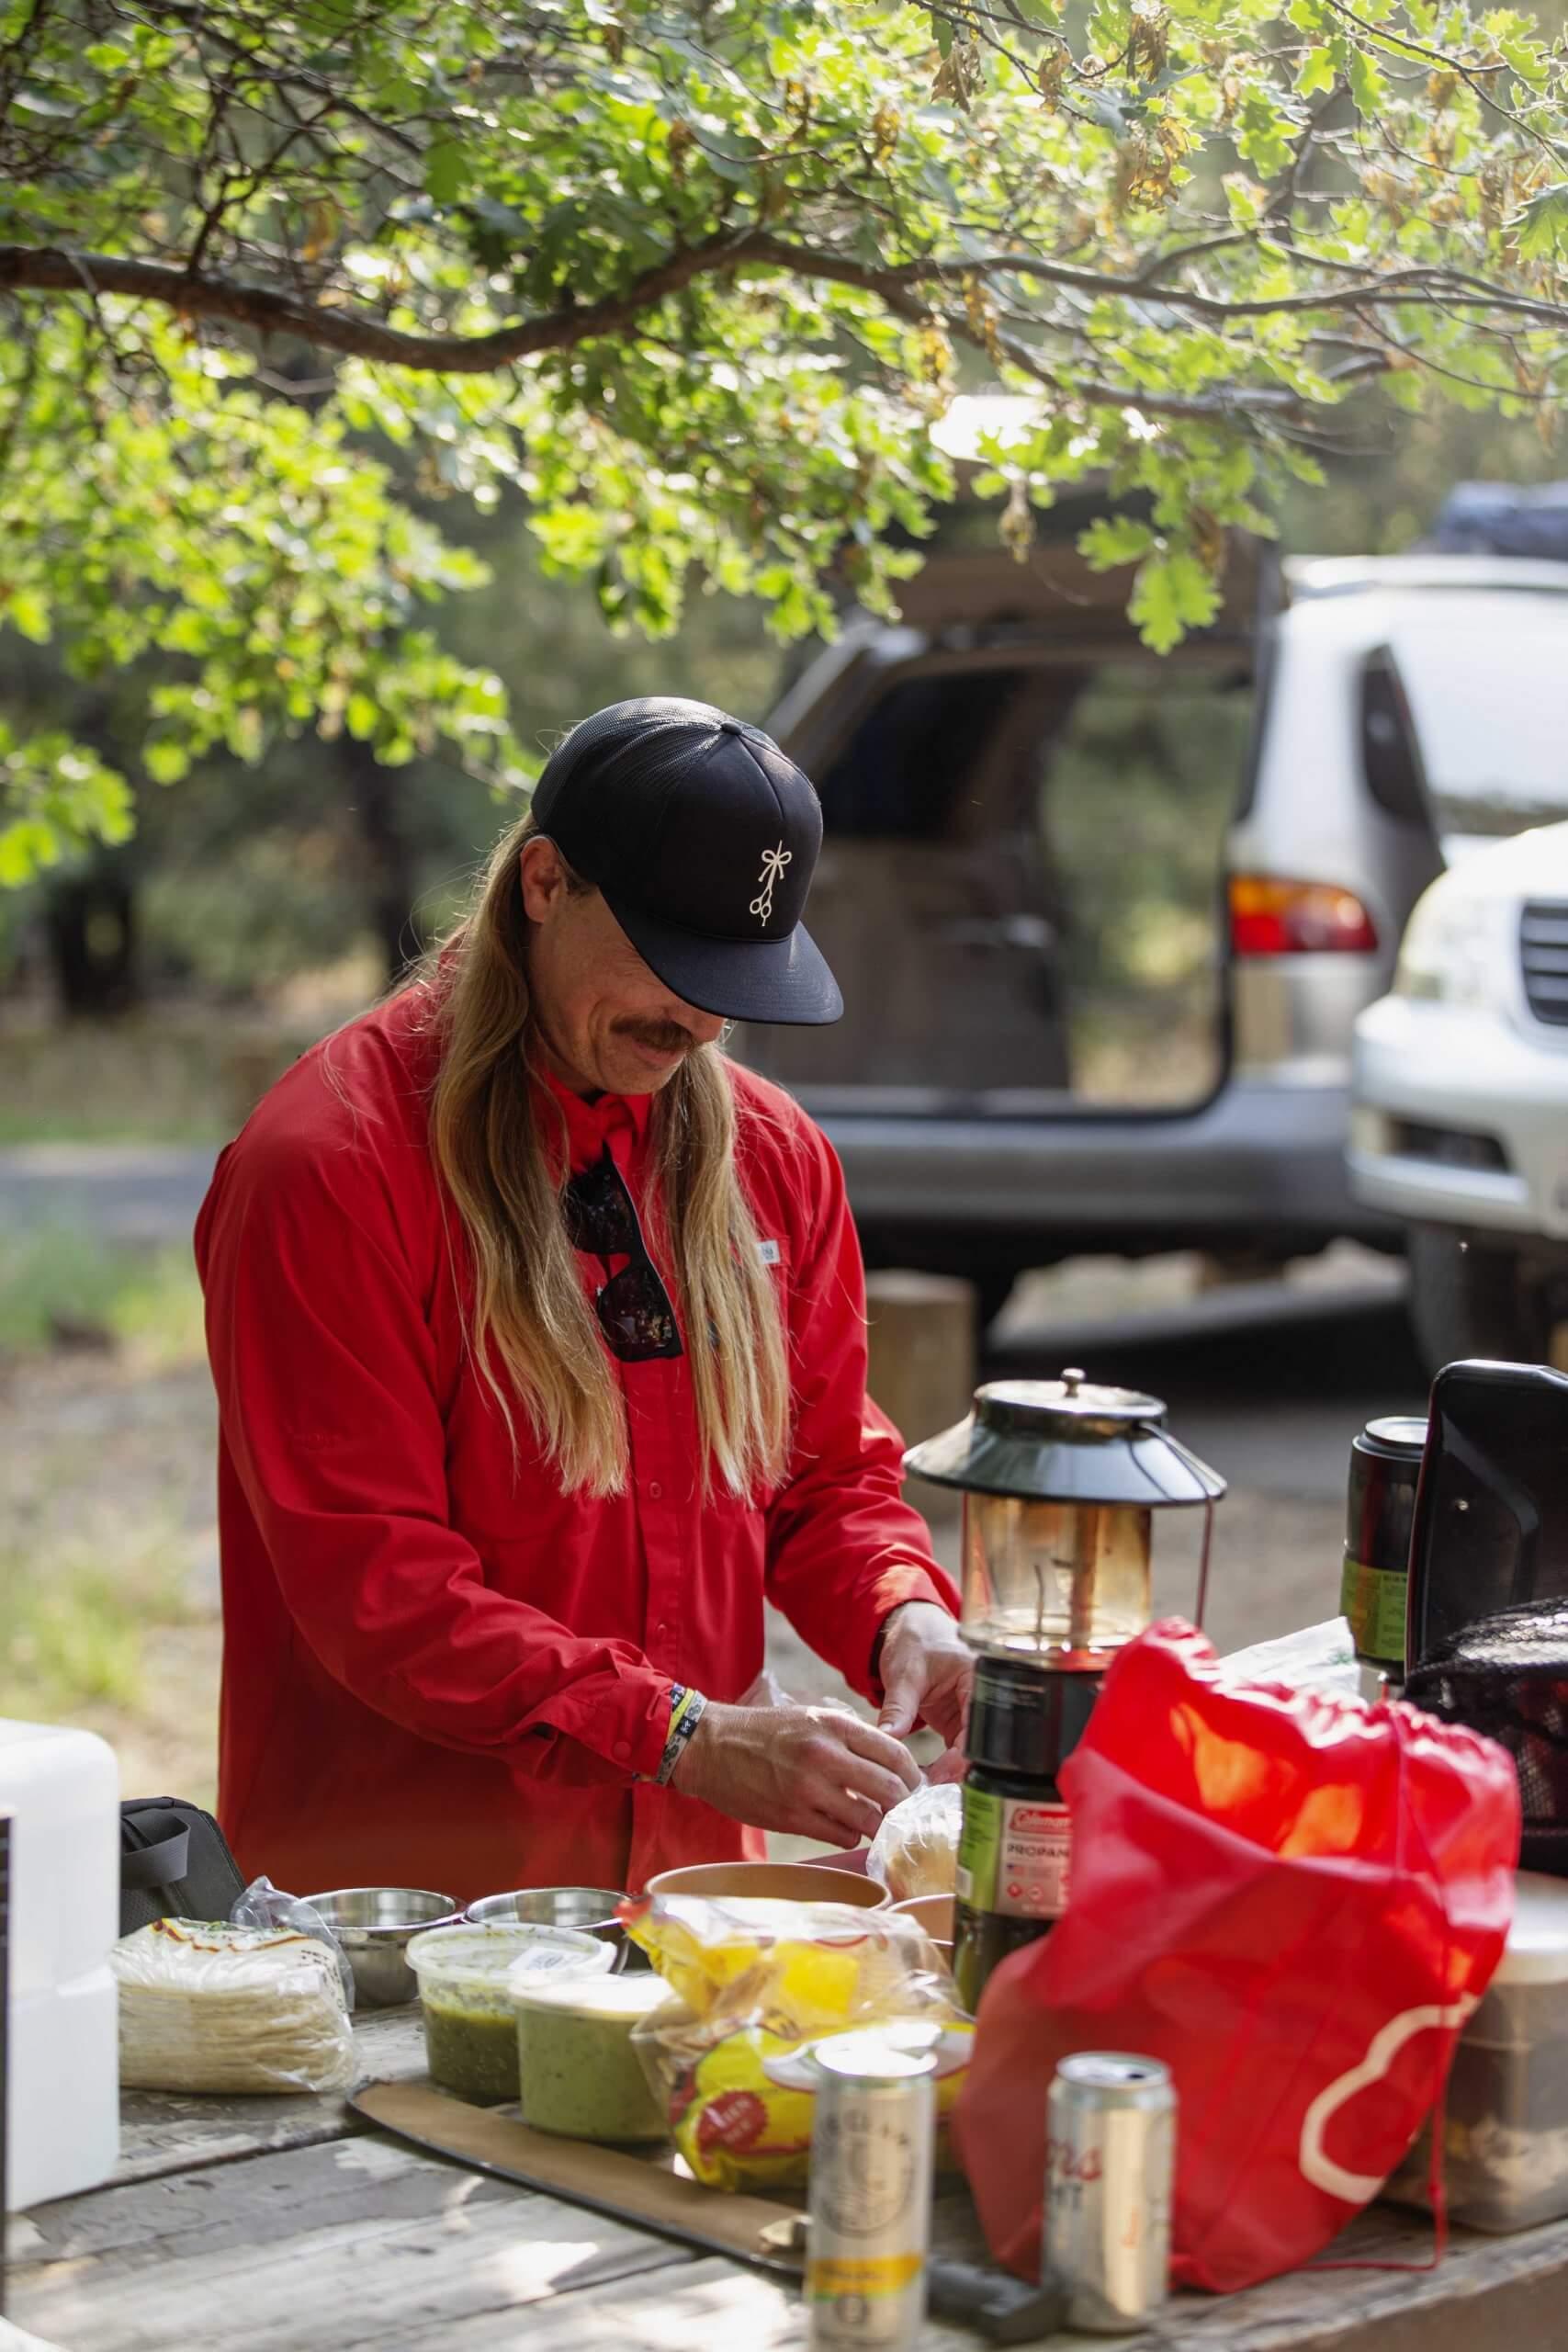 El Rubio cutting on the camping trip photo shoot